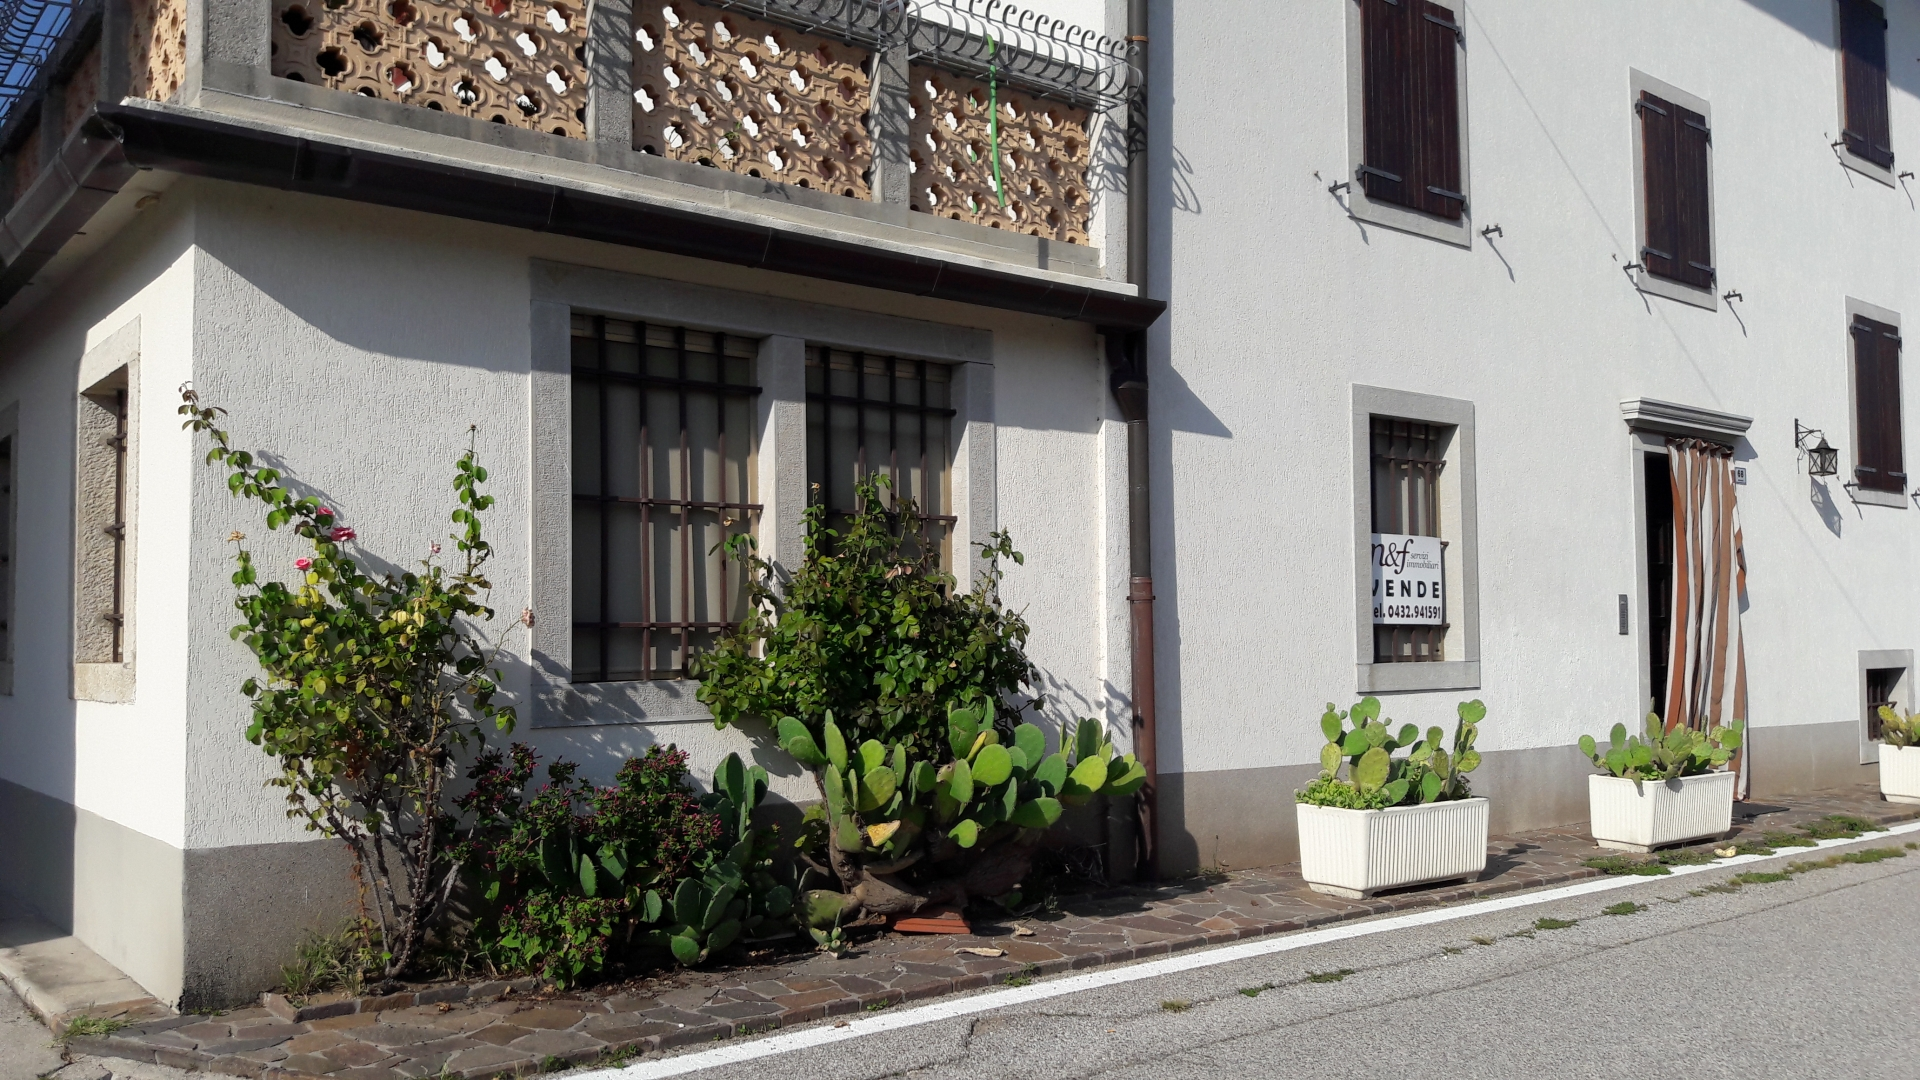 Casa in vendita a San Daniele del Friuli - Slideshow 7